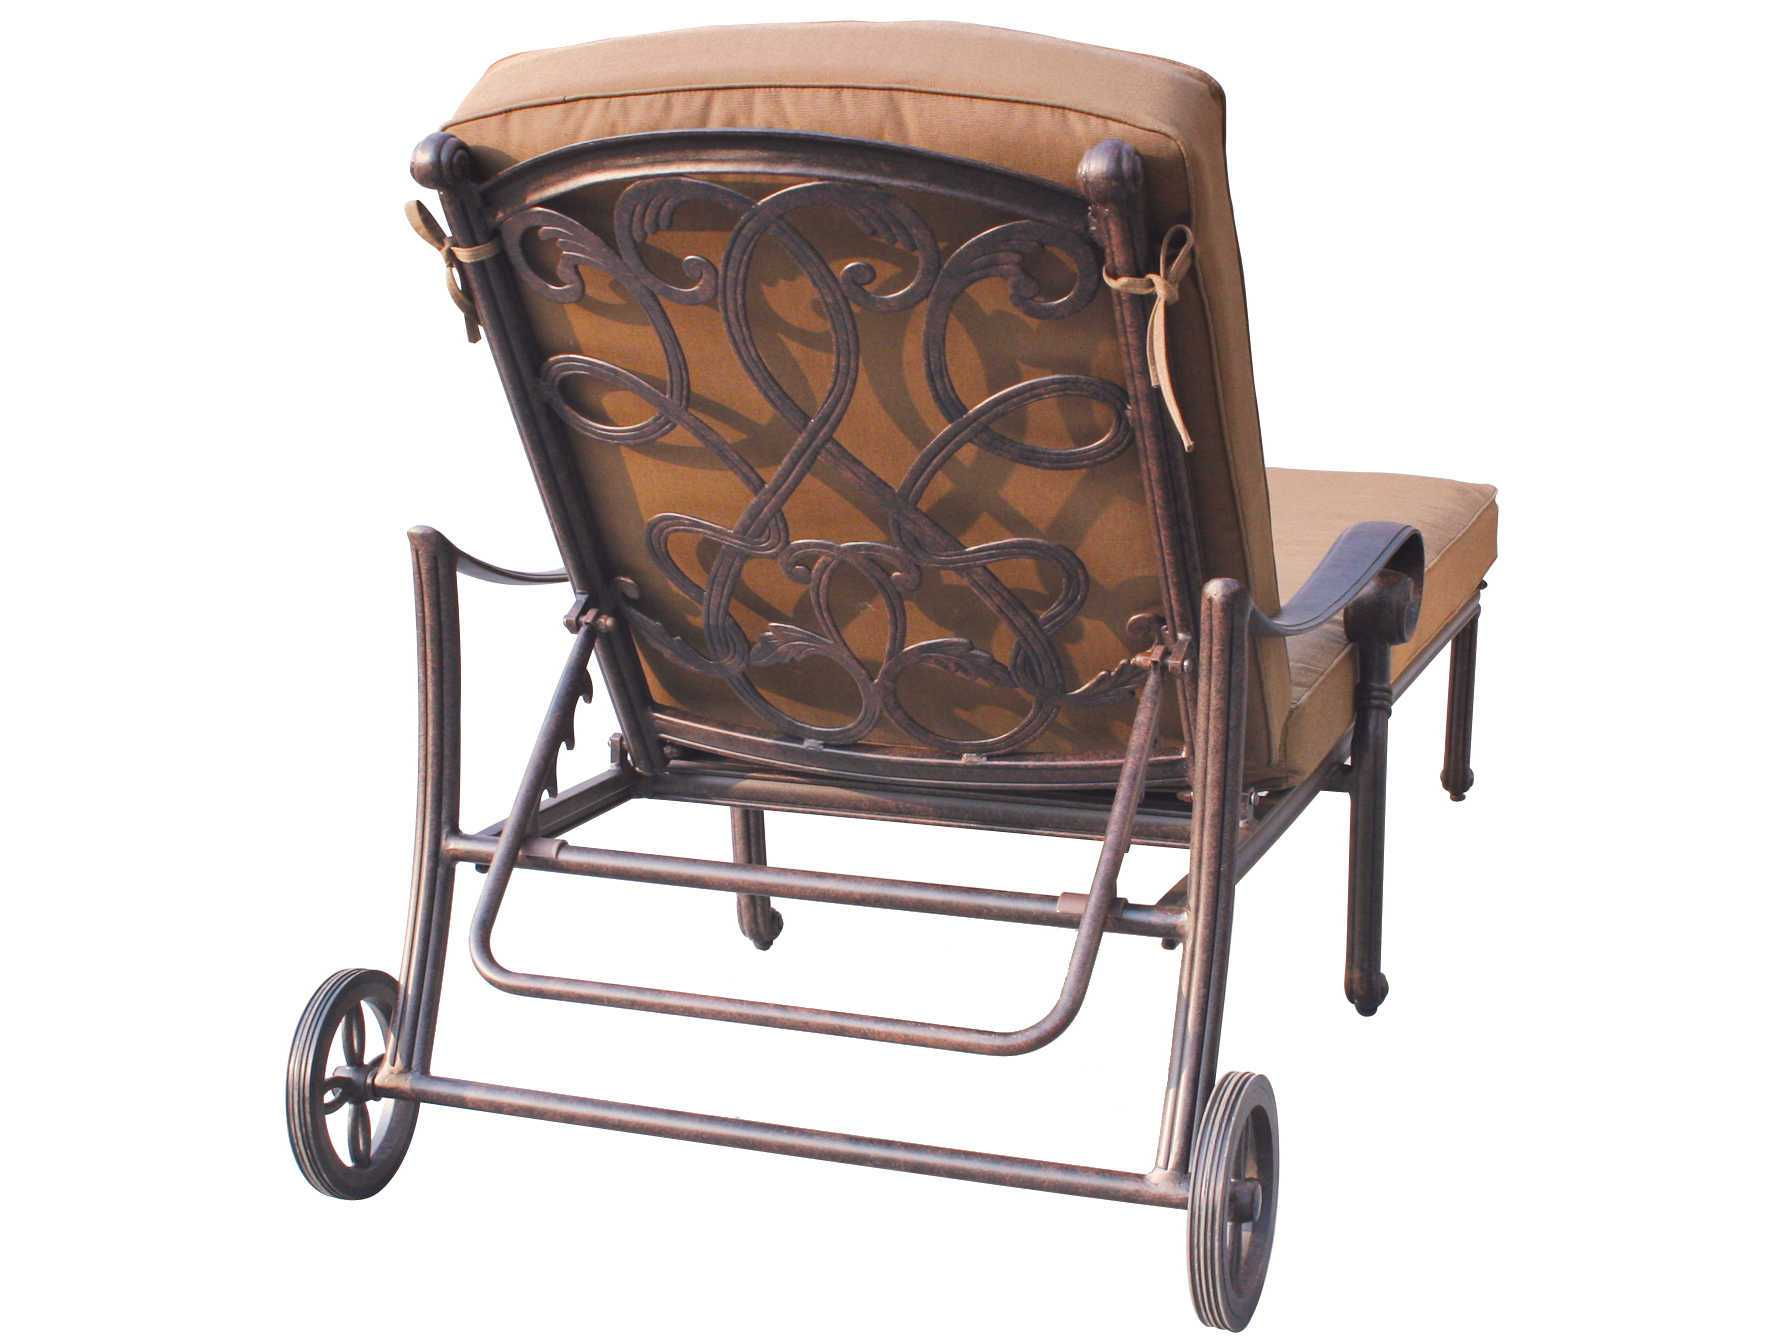 darlee outdoor living standard santa monica cast aluminum antique bronze chaise lounge dl2052 33. Black Bedroom Furniture Sets. Home Design Ideas